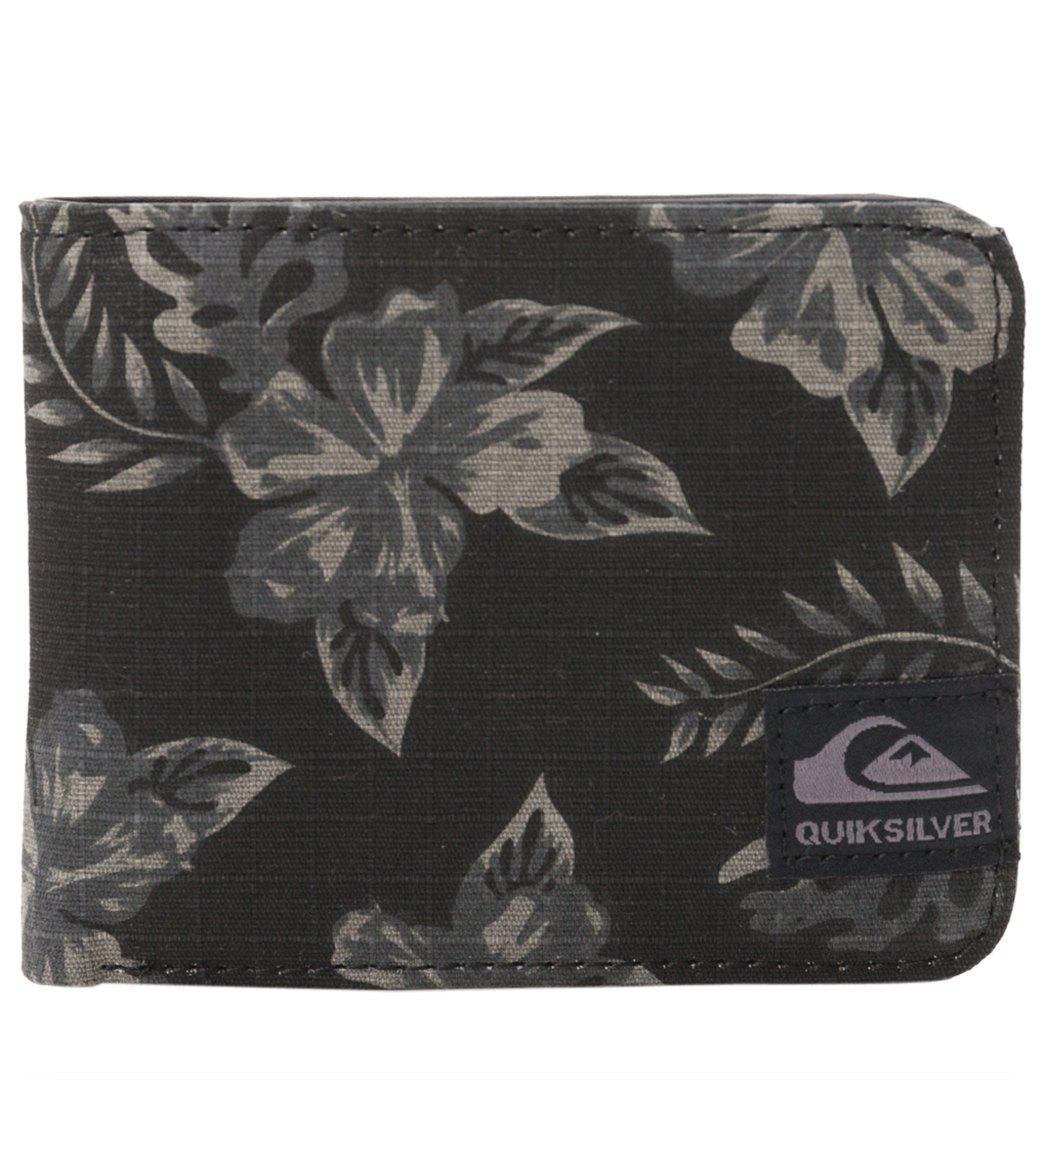 924718e3e0 Quiksilver Jungle Wallet